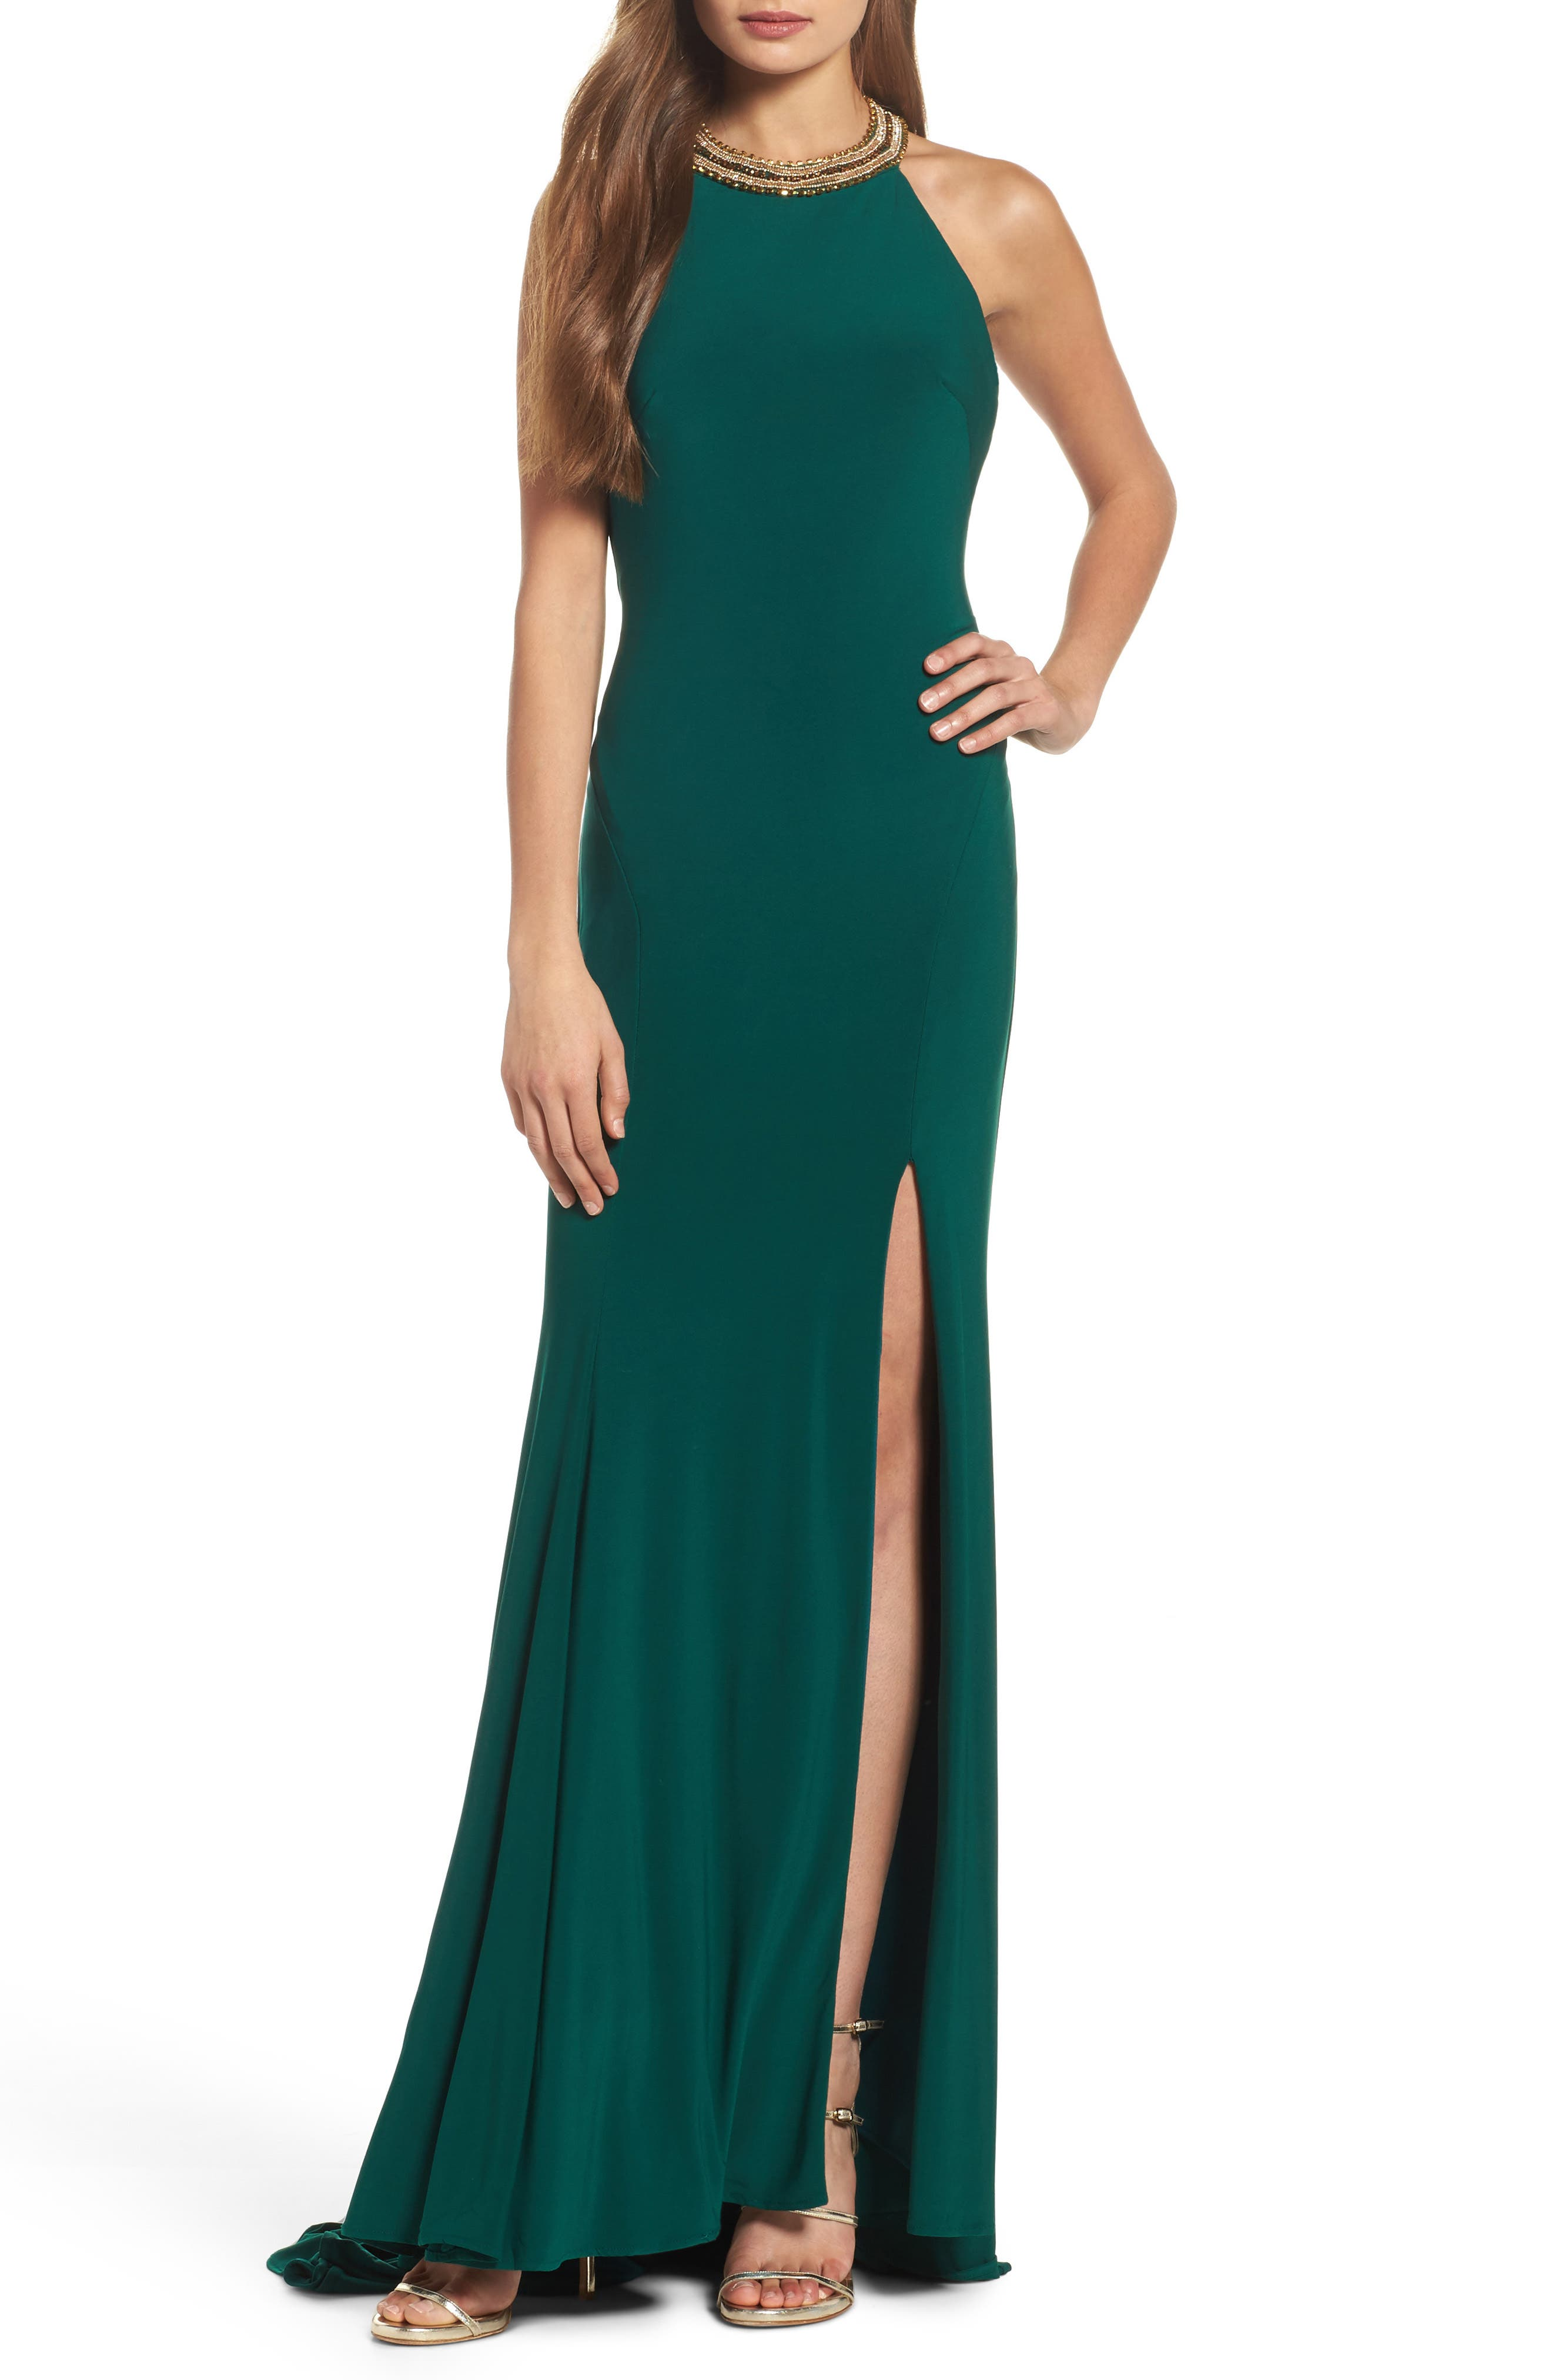 Alternate Image 1 Selected - Mac Duggal Beaded Halter Neck Gown